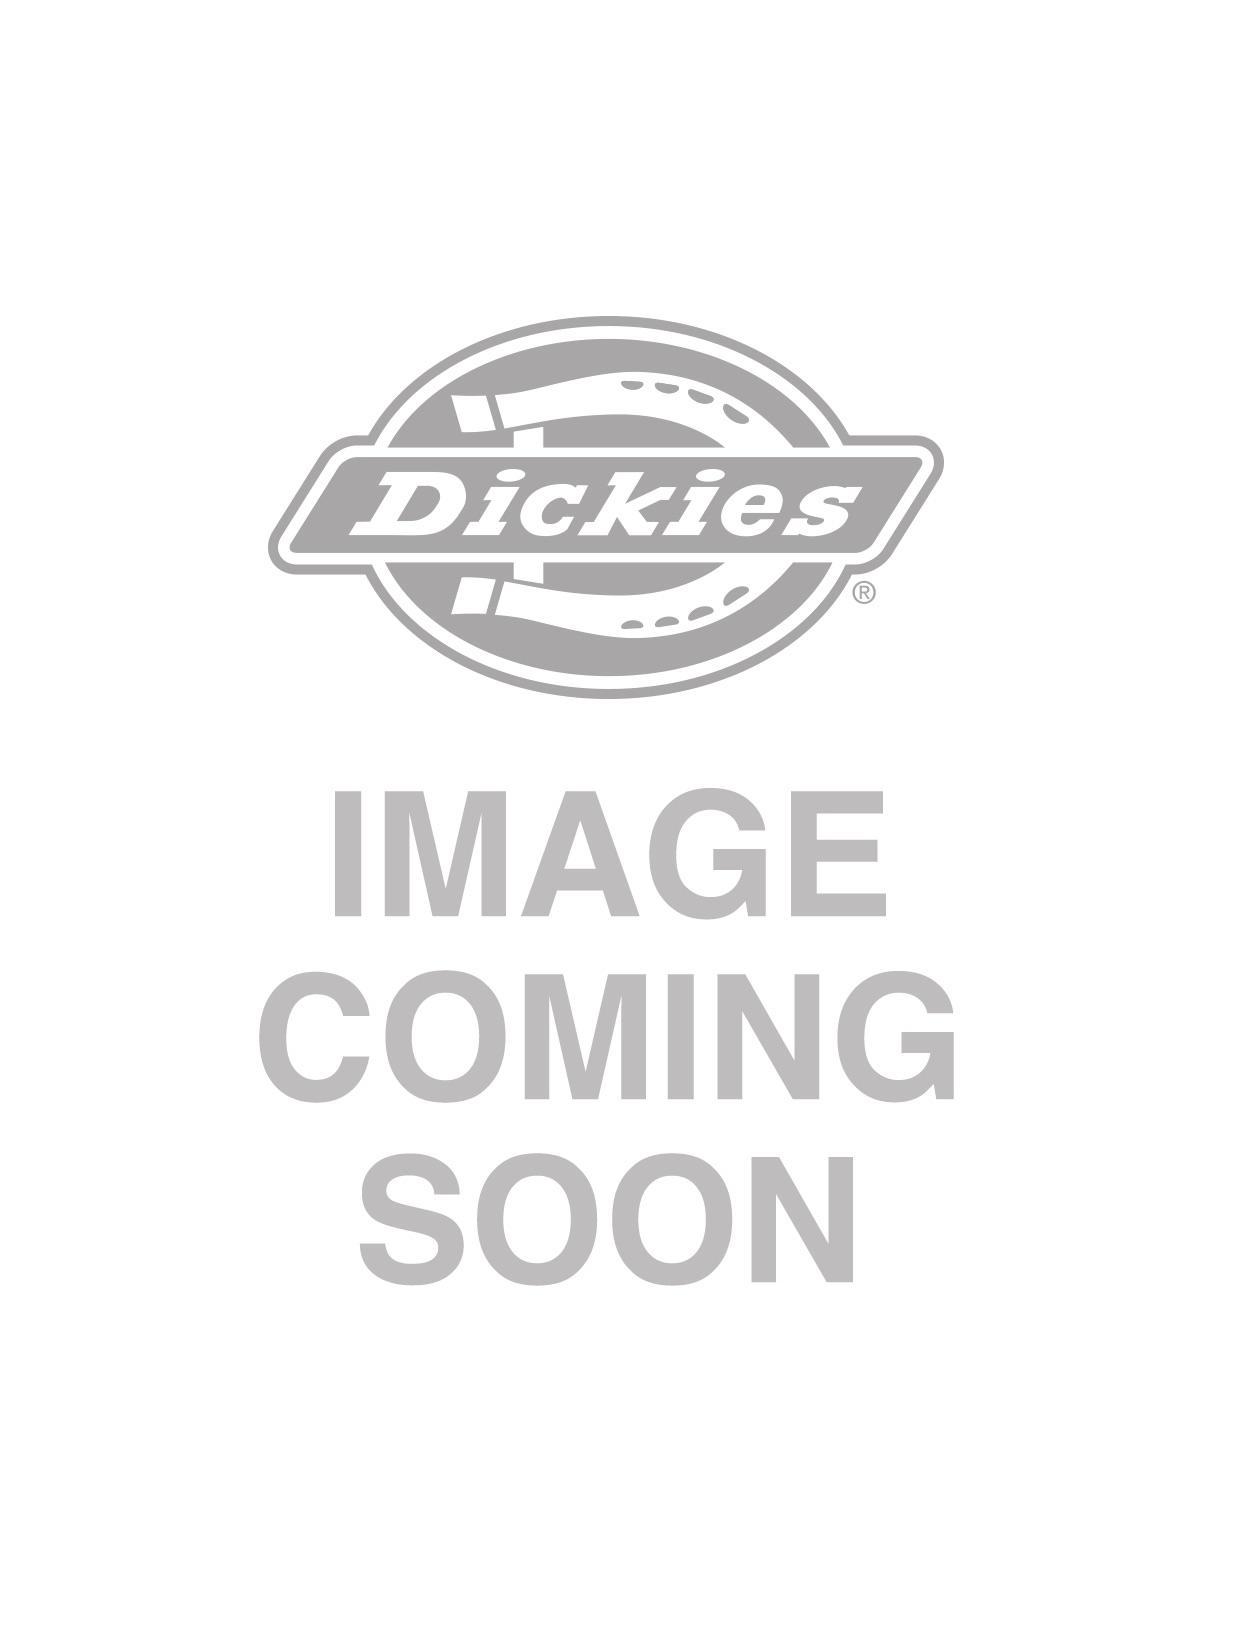 Dickies Coalton Shirt